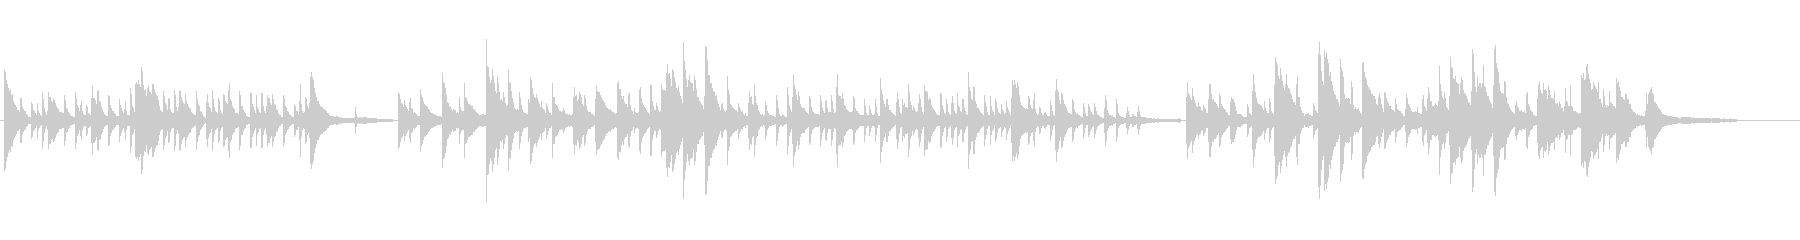 Moist ballad piano 2's unreproduced waveform